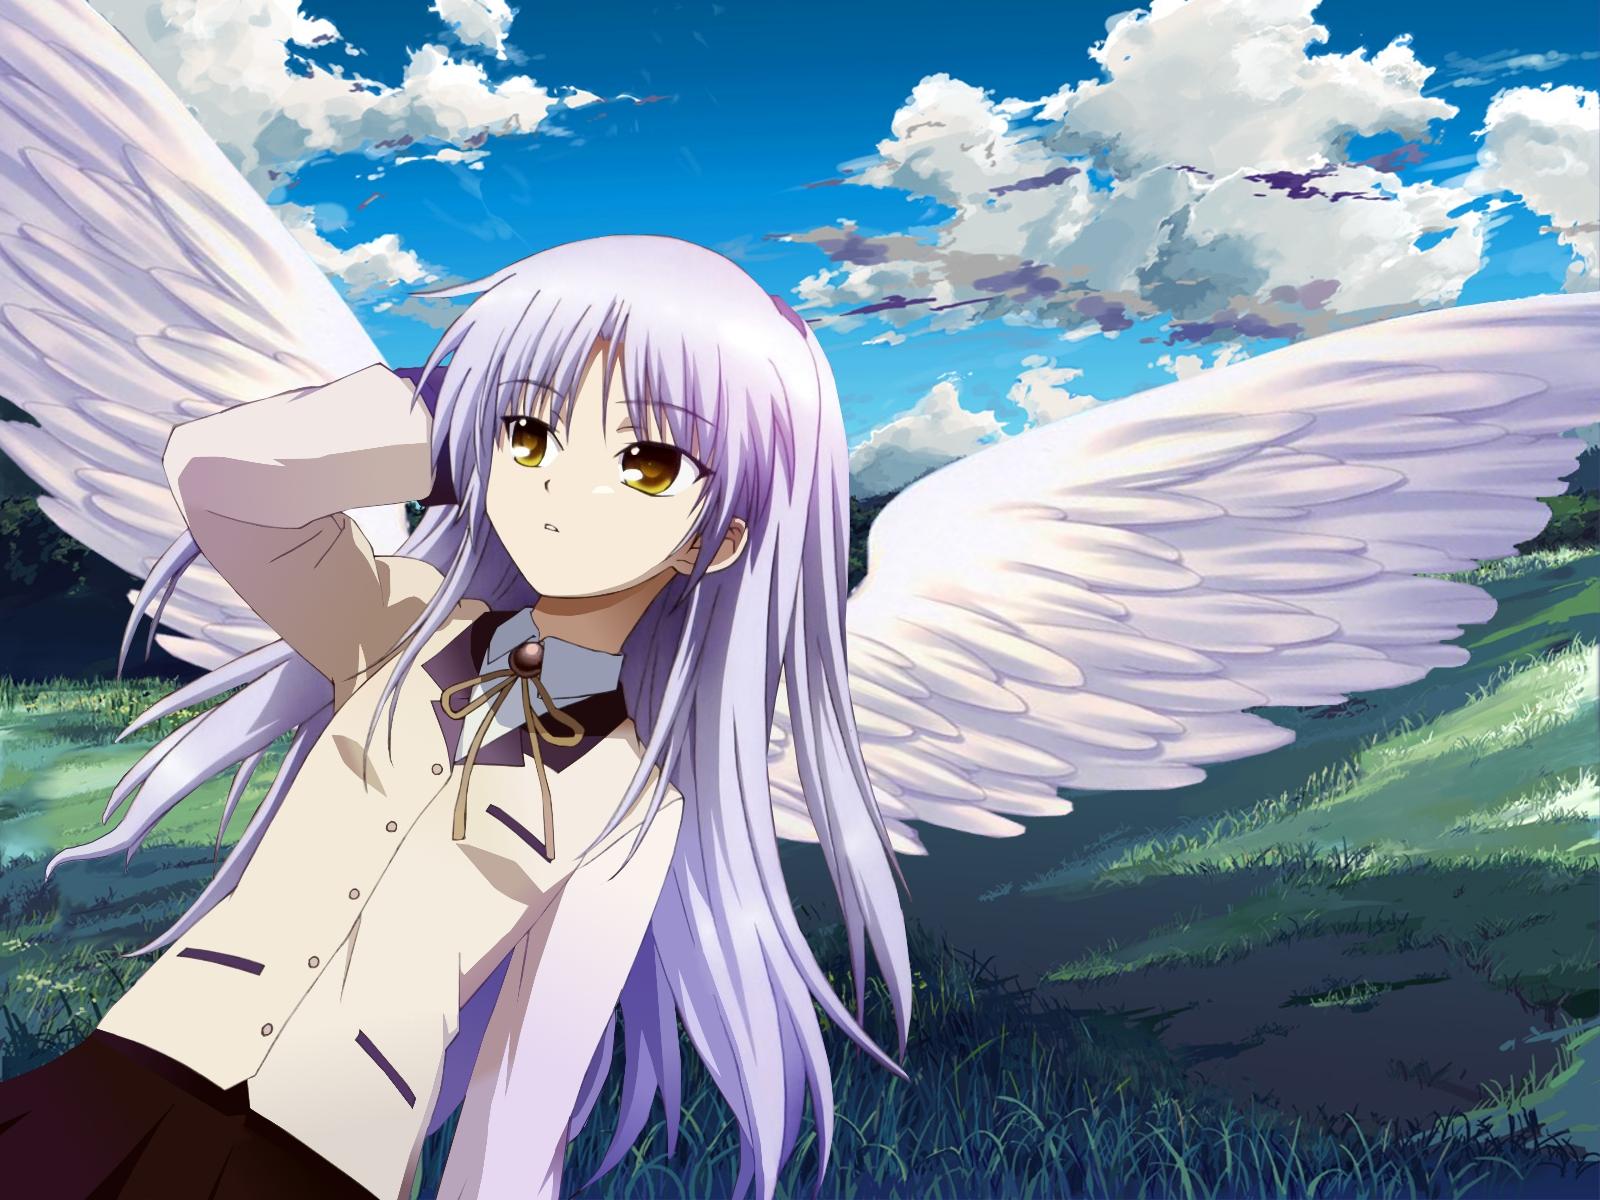 Tachibana Angel Beats